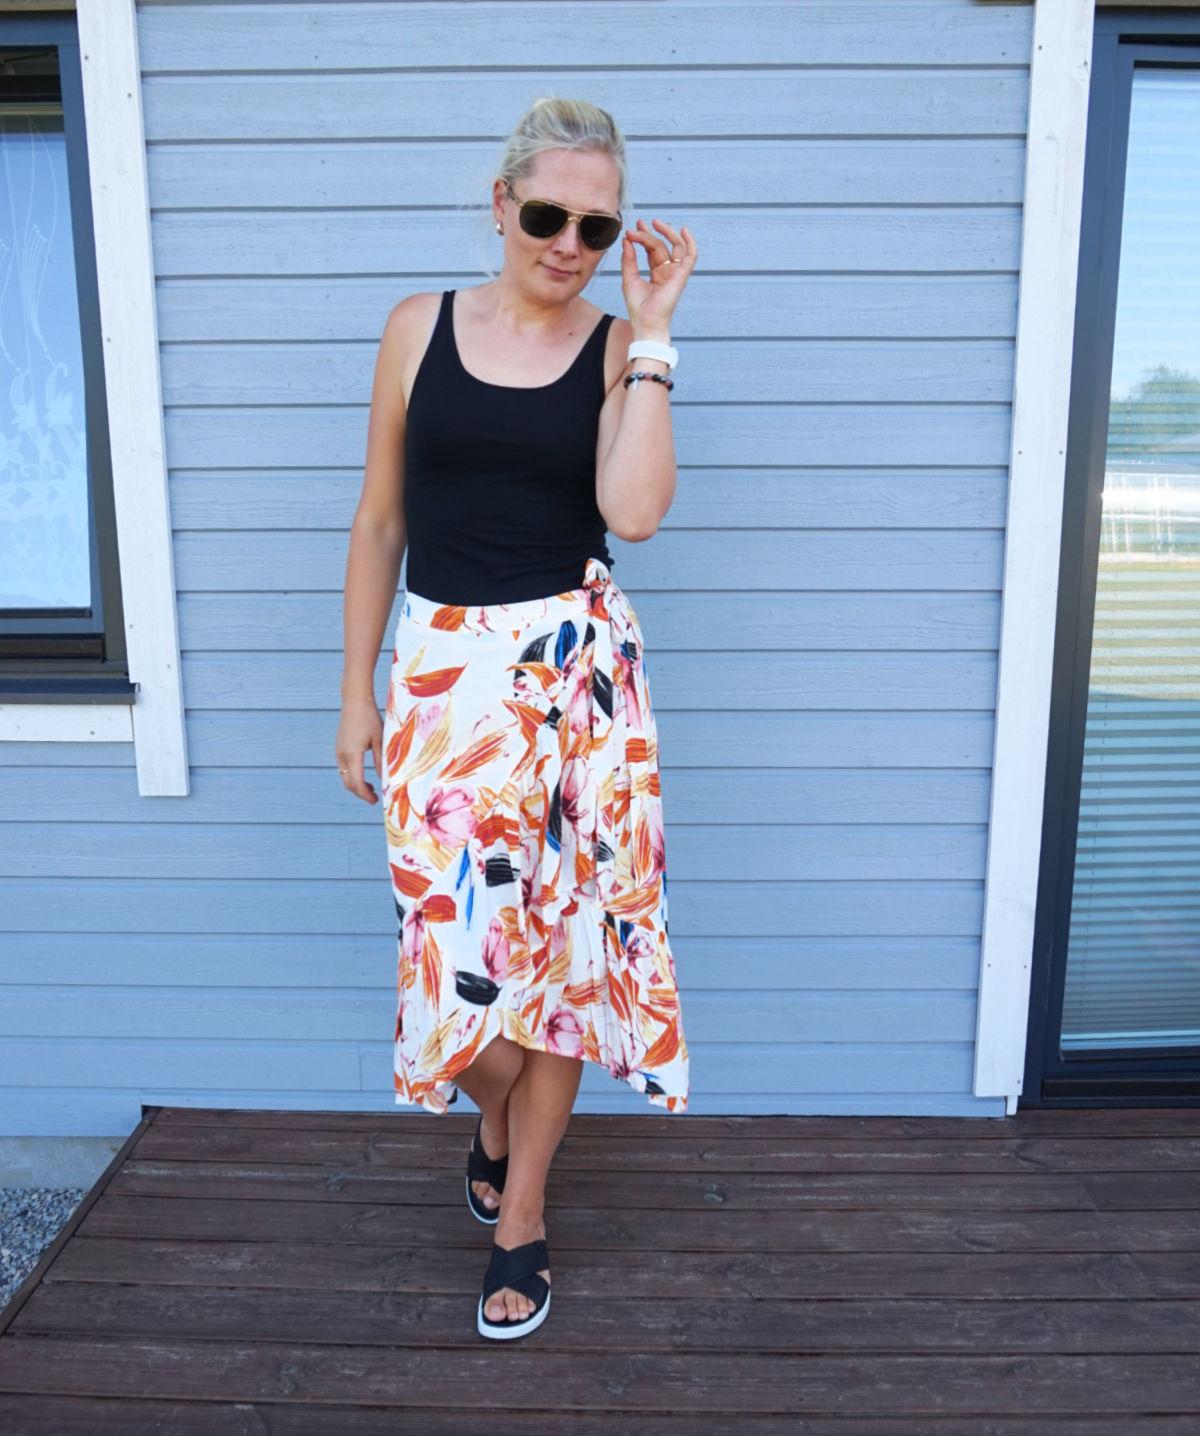 Lindex Wendy wrap skirt Ecco Flow LX W sandals